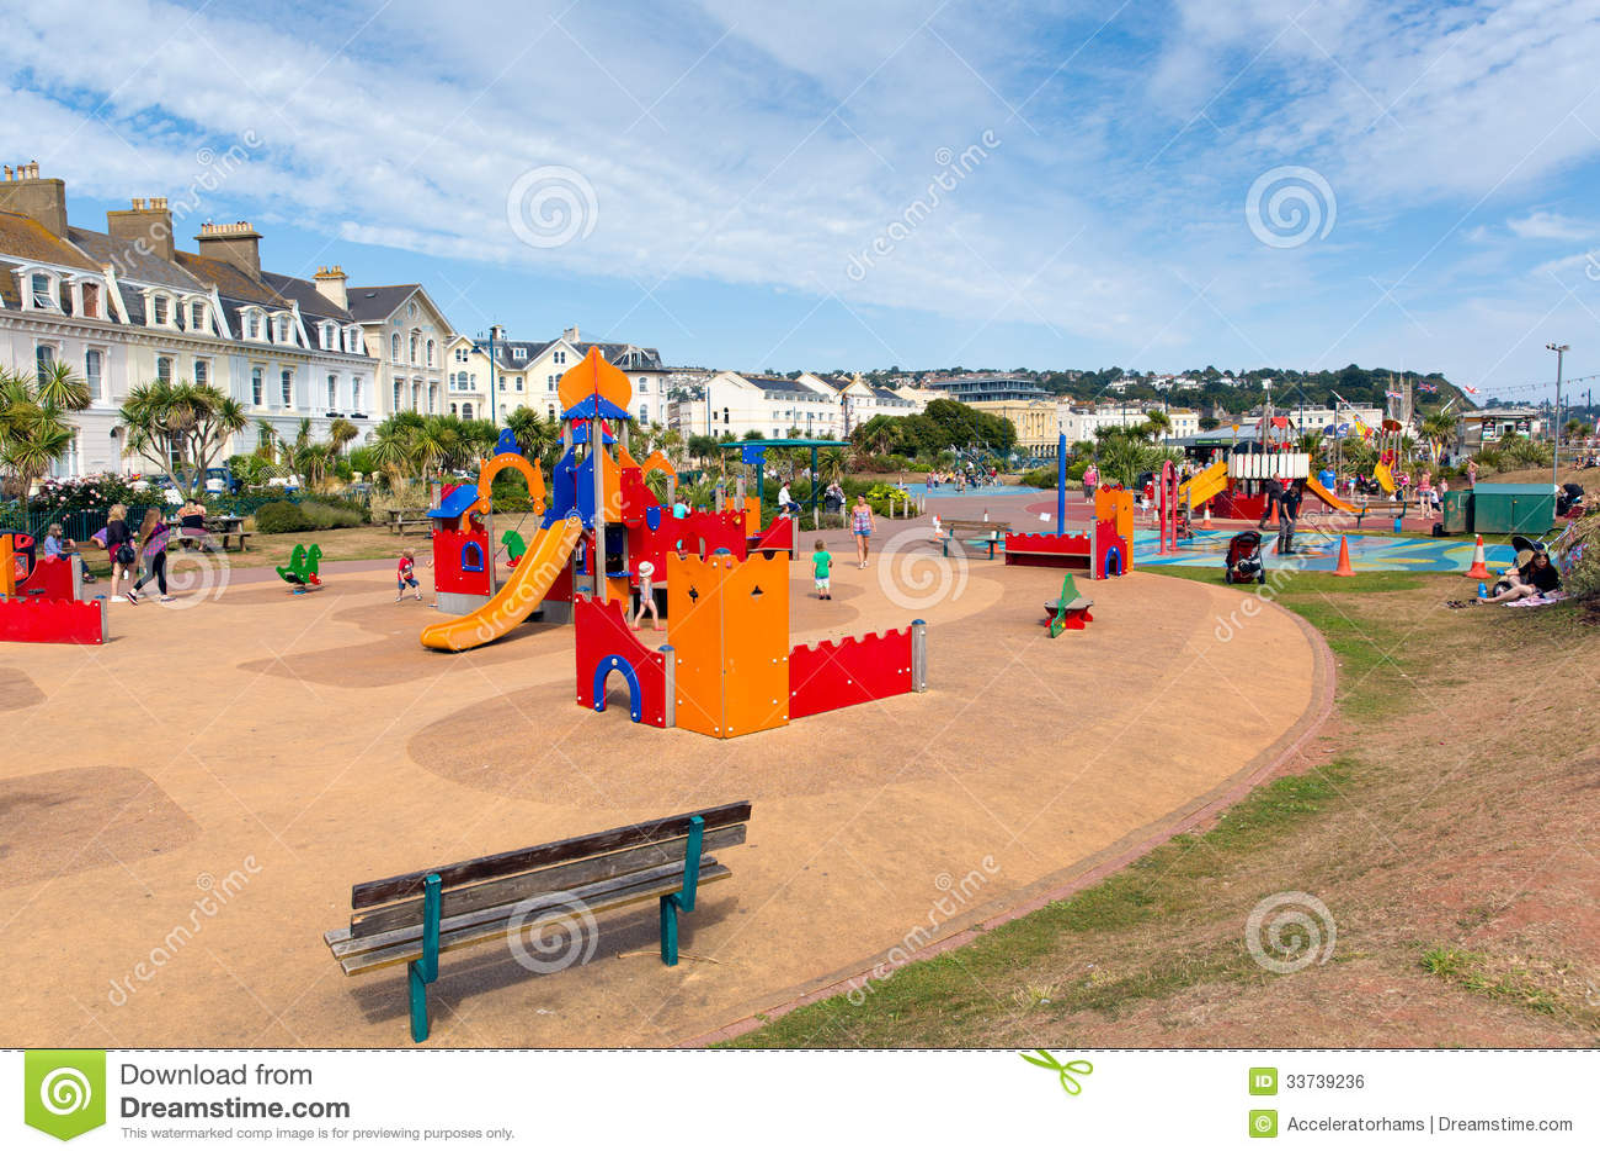 Teignmouth沿海岸区德文郡儿童的活动现场